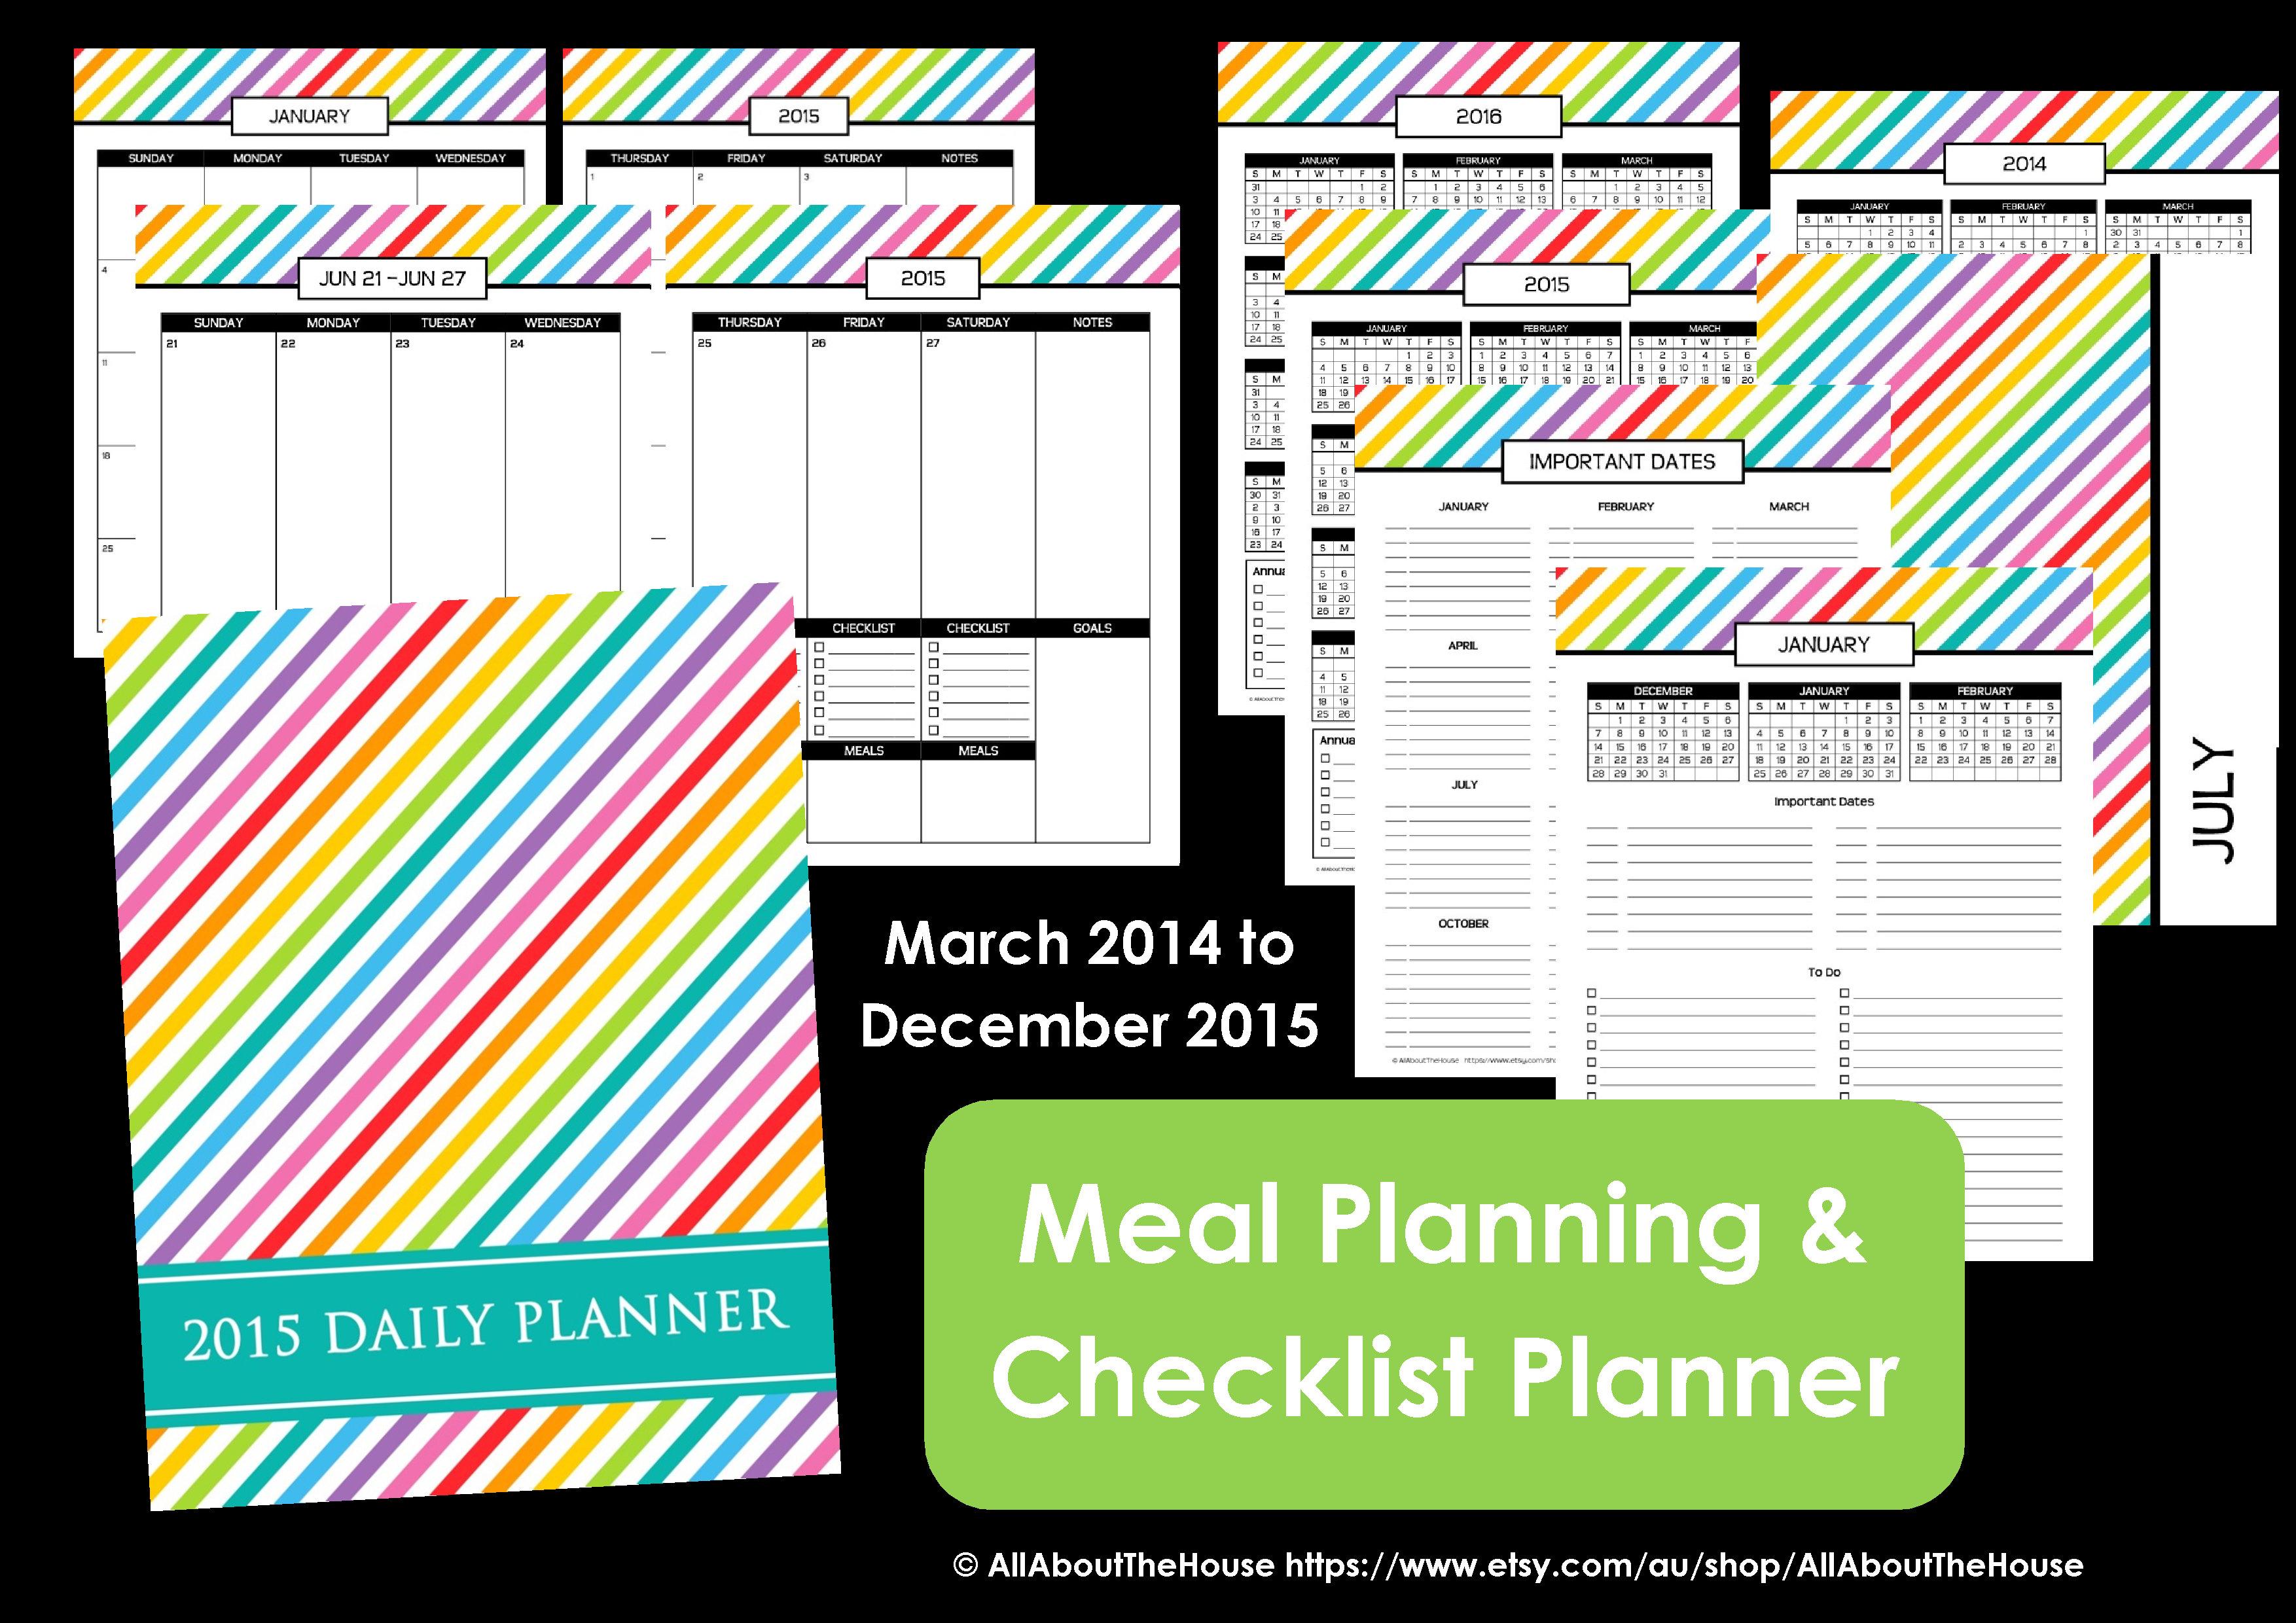 meal Planning checklist planner